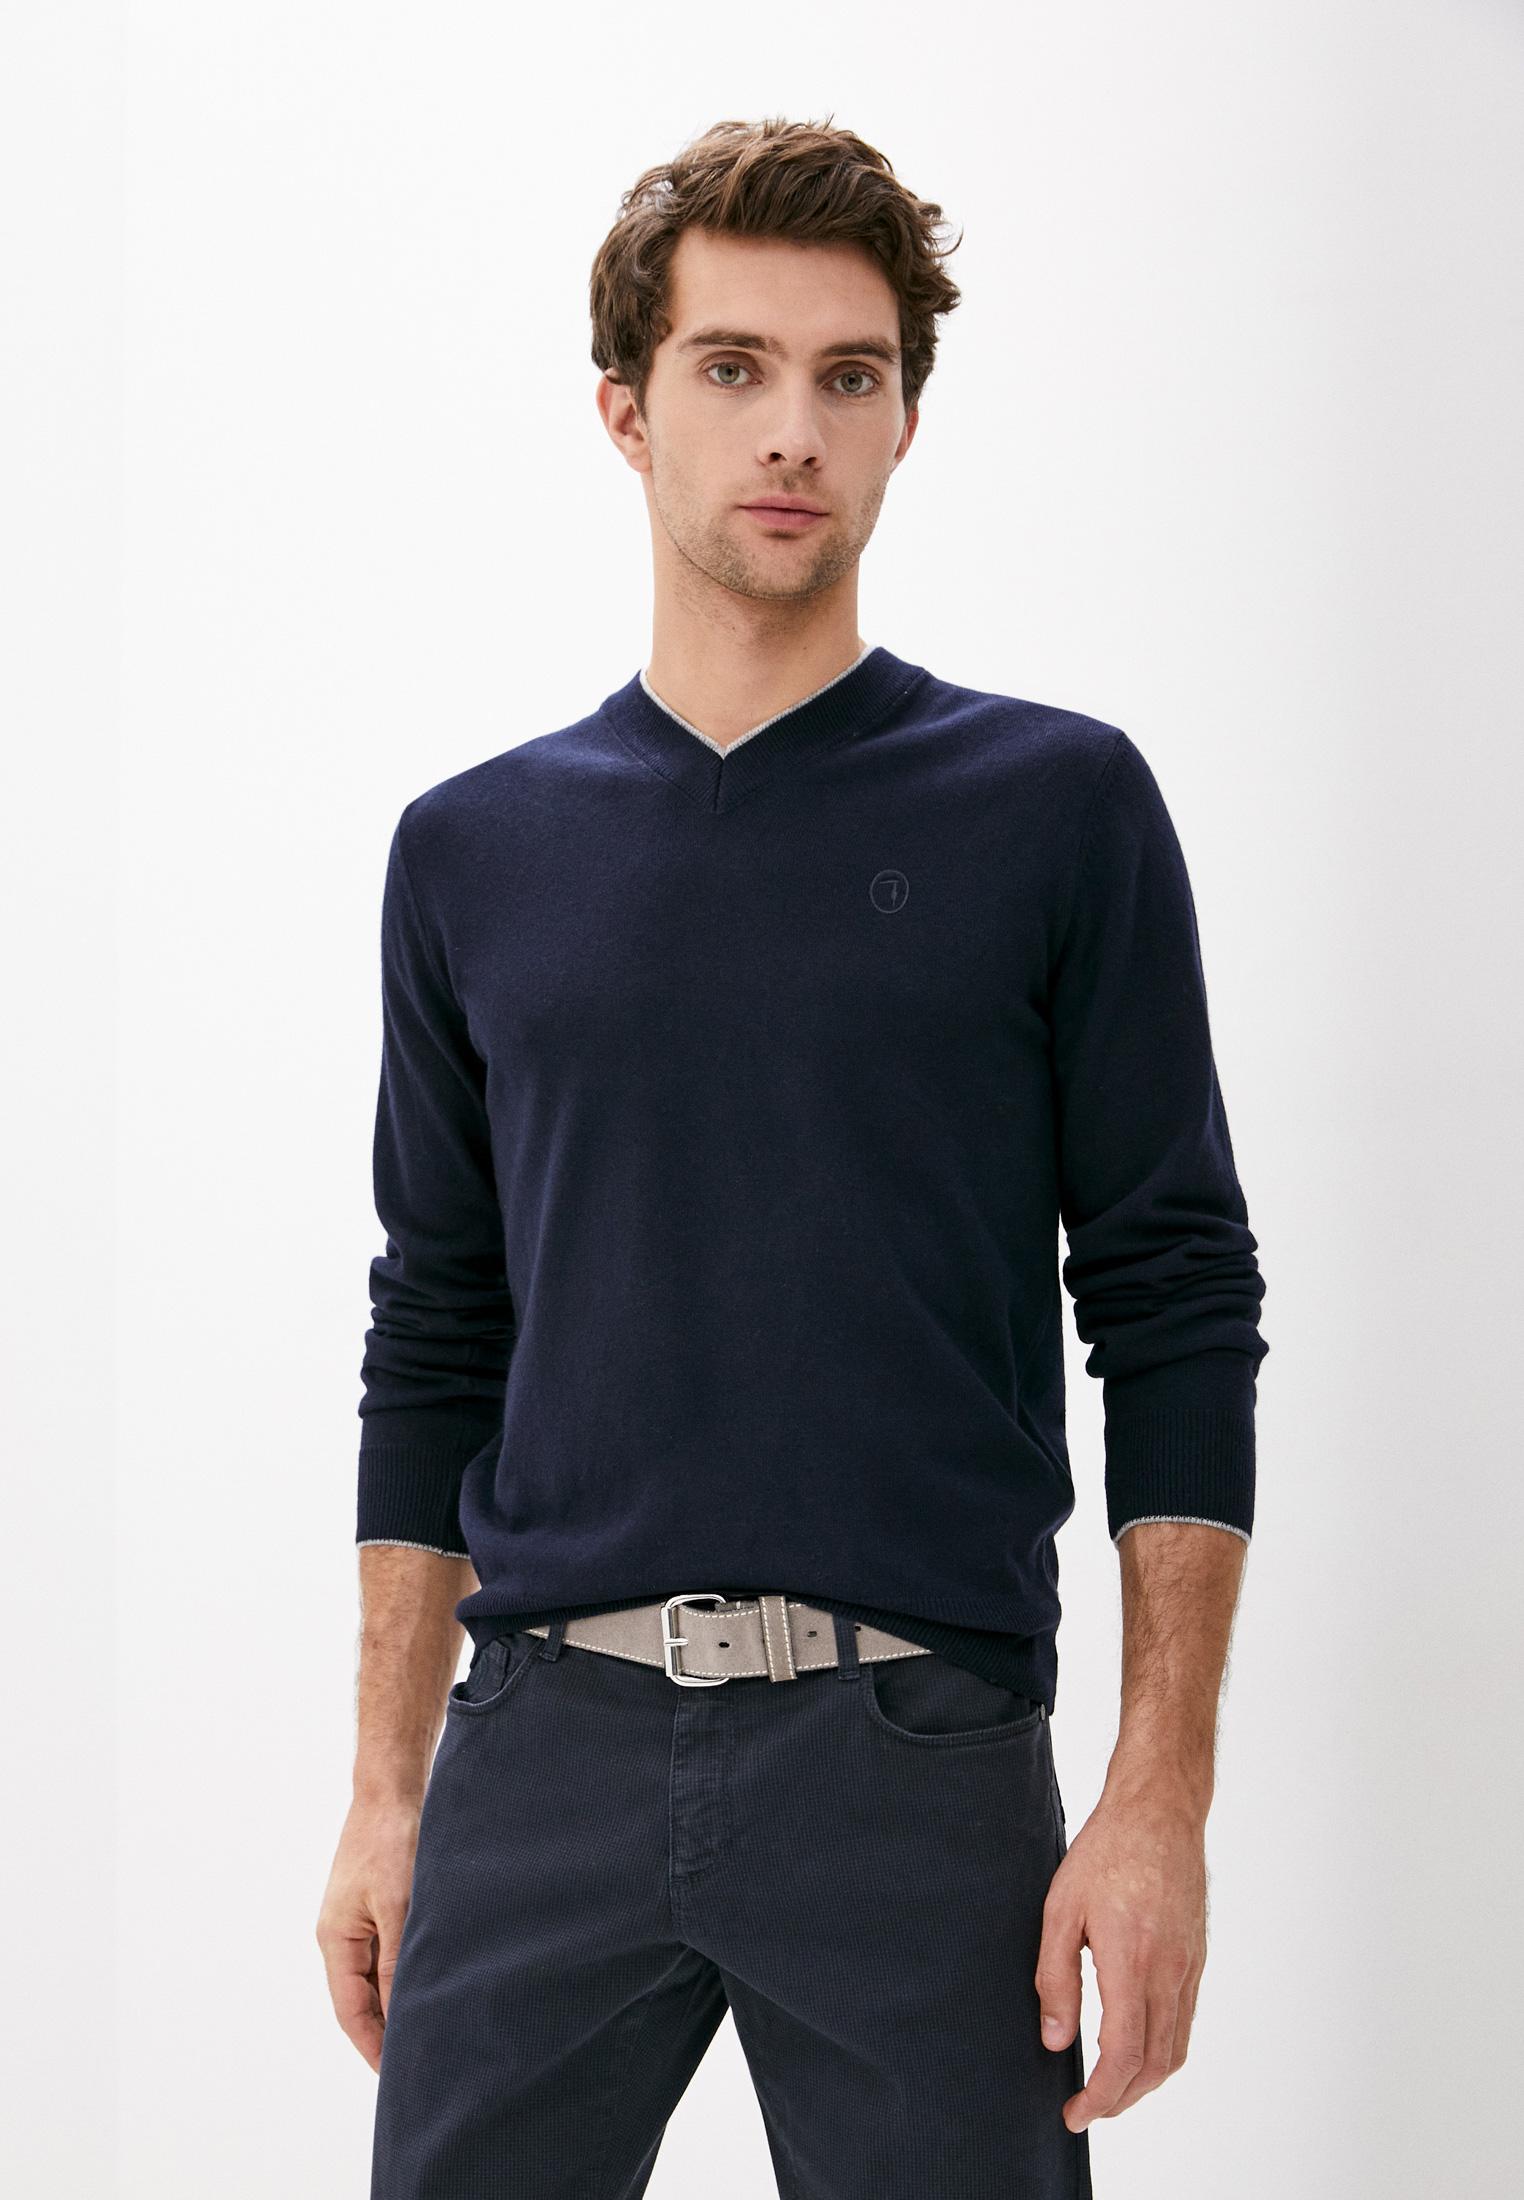 Пуловер Trussardi Jeans за 10 600 ₽. в интернет-магазине Lamoda.ru